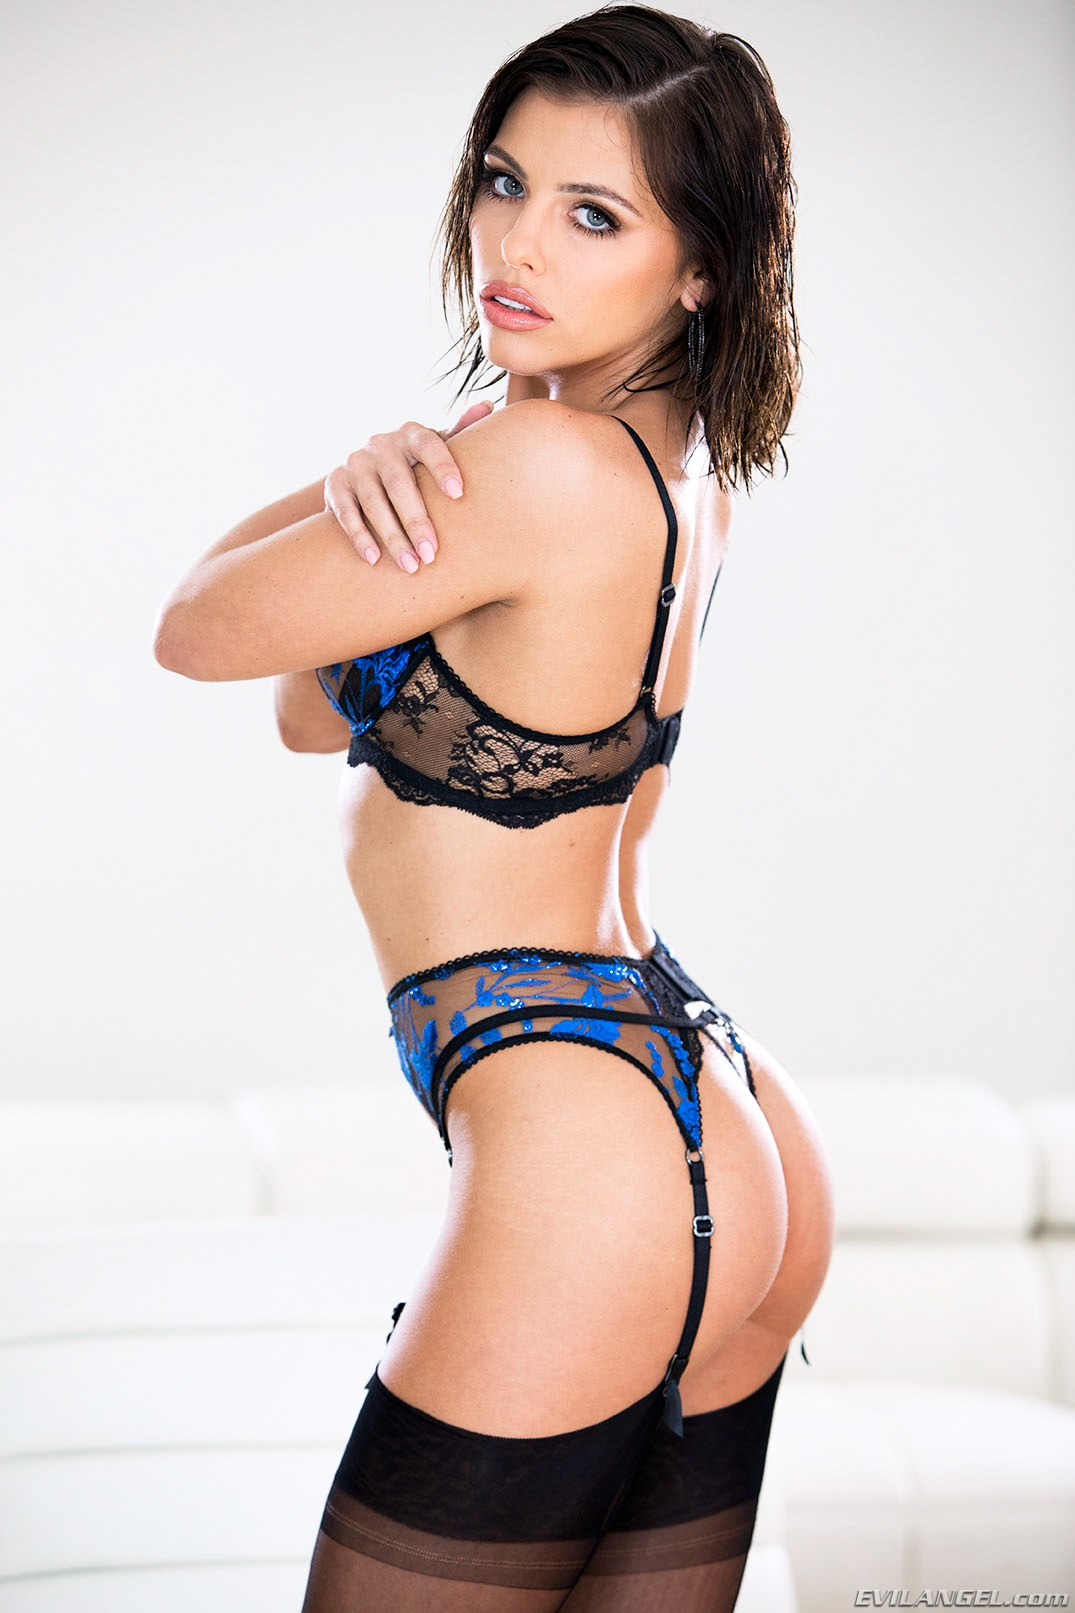 Adriana Chechik The Ultimate Slut adriana chechik: ultimate slut sc. 2 - evil angel 133516